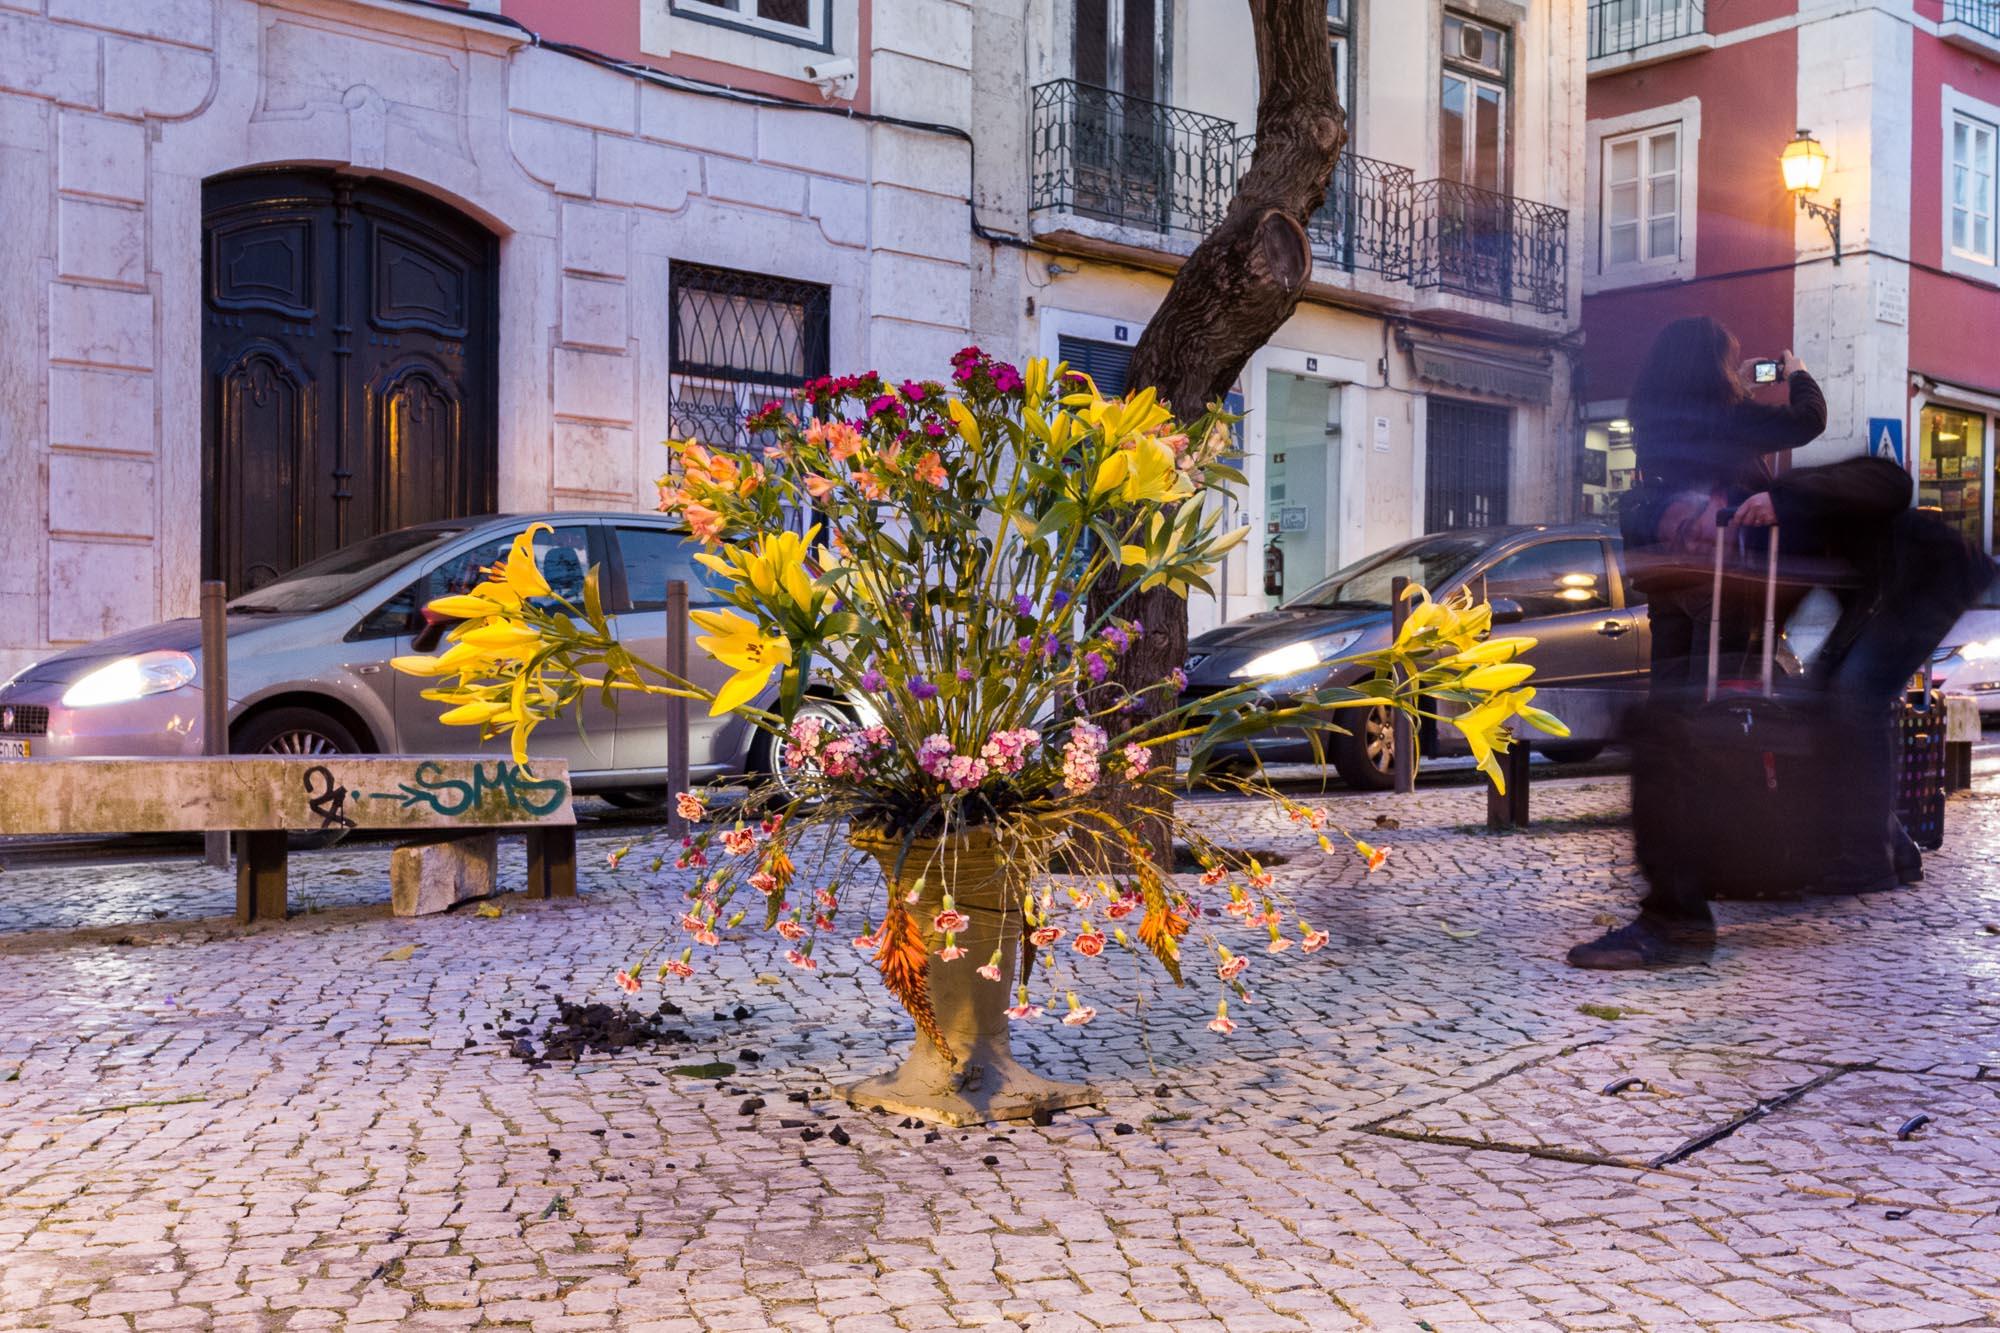 Flowers Arranged In Burning Charcoal   - 3 (Requiem) , 2014, 45 min.  Place:  Manpower - international art festival, Lisbon, PT  Material:  Flowers, burning charcoals, clayey unfired Lisbon soil, various props